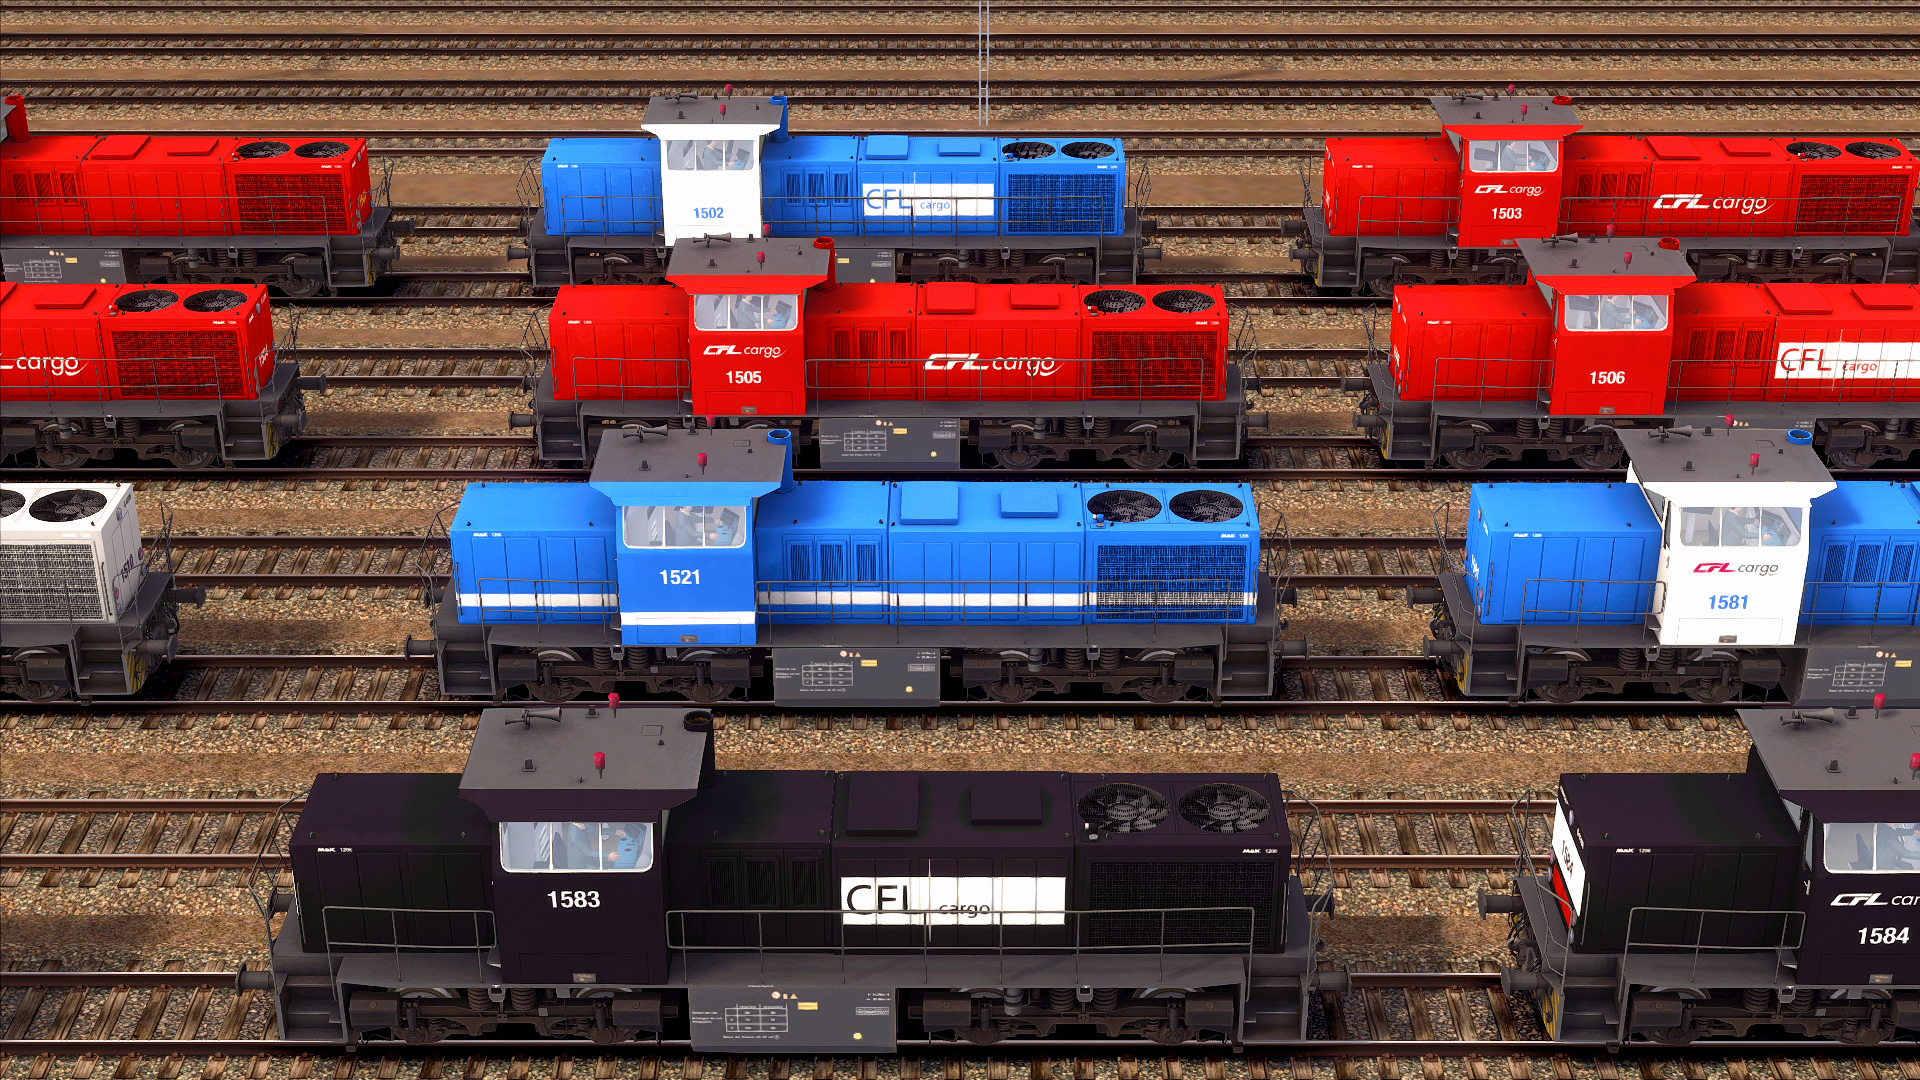 RailWorks64_2021-04-15_00-15-57.jpg